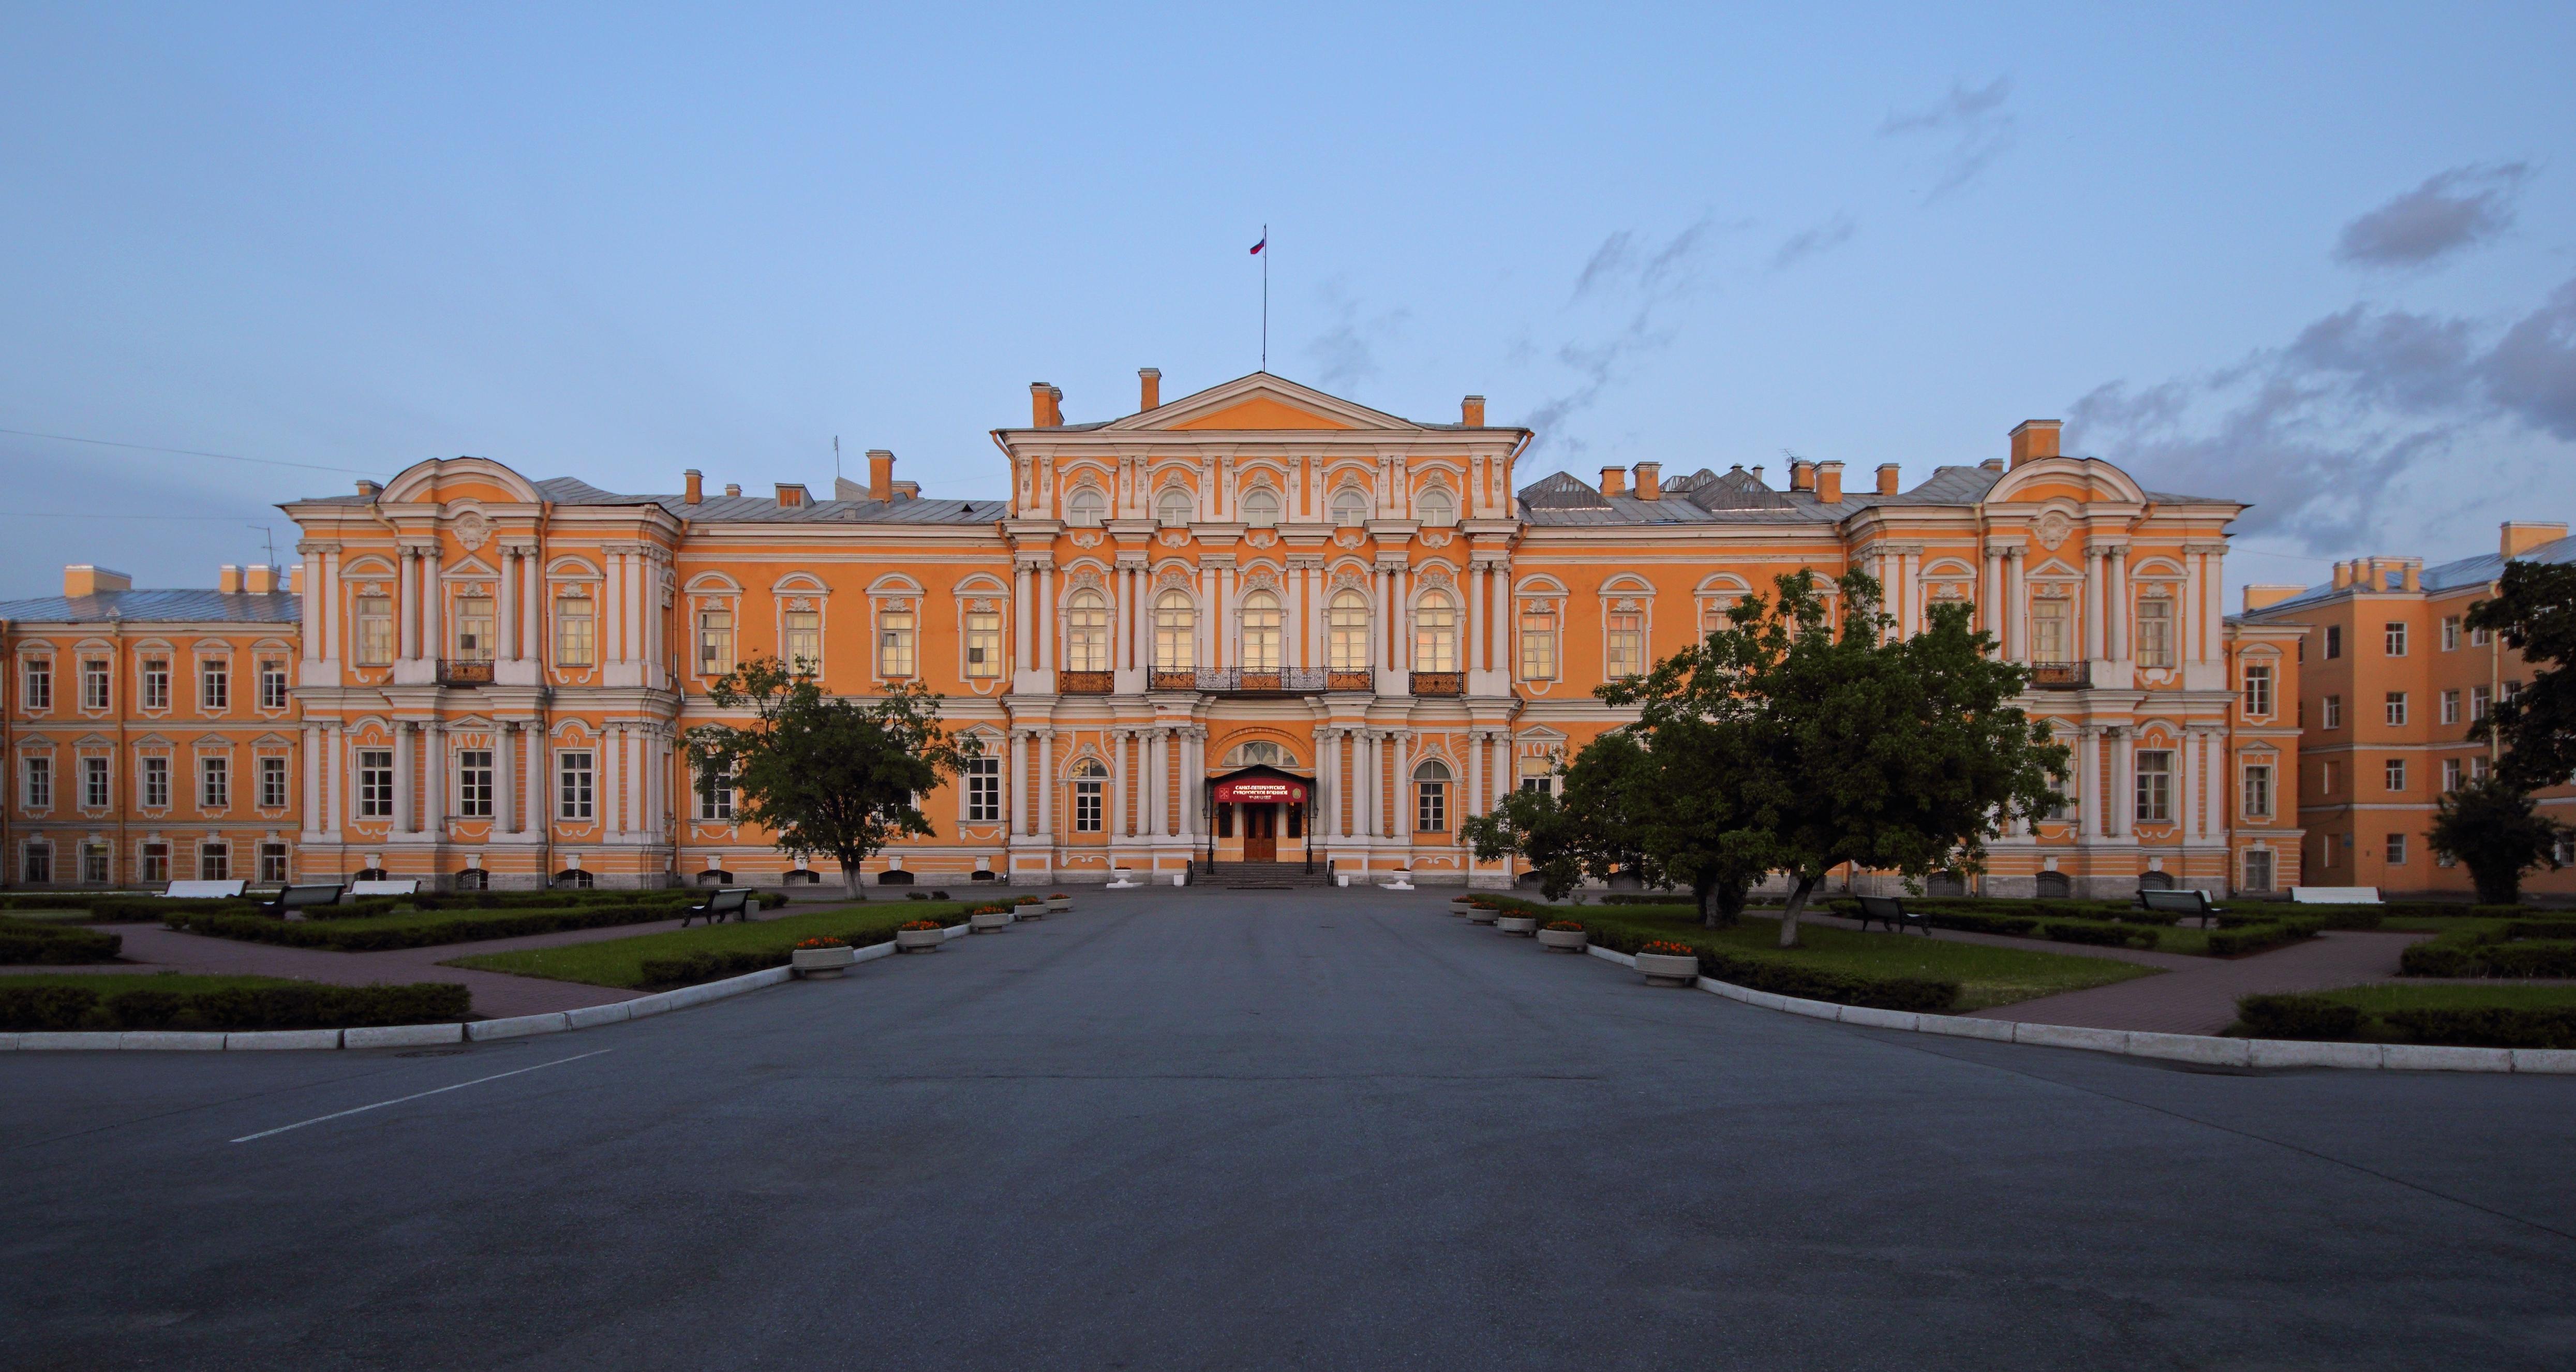 http://upload.wikimedia.org/wikipedia/commons/9/91/Spb_06-2012_Vorontsov_Palace.jpg